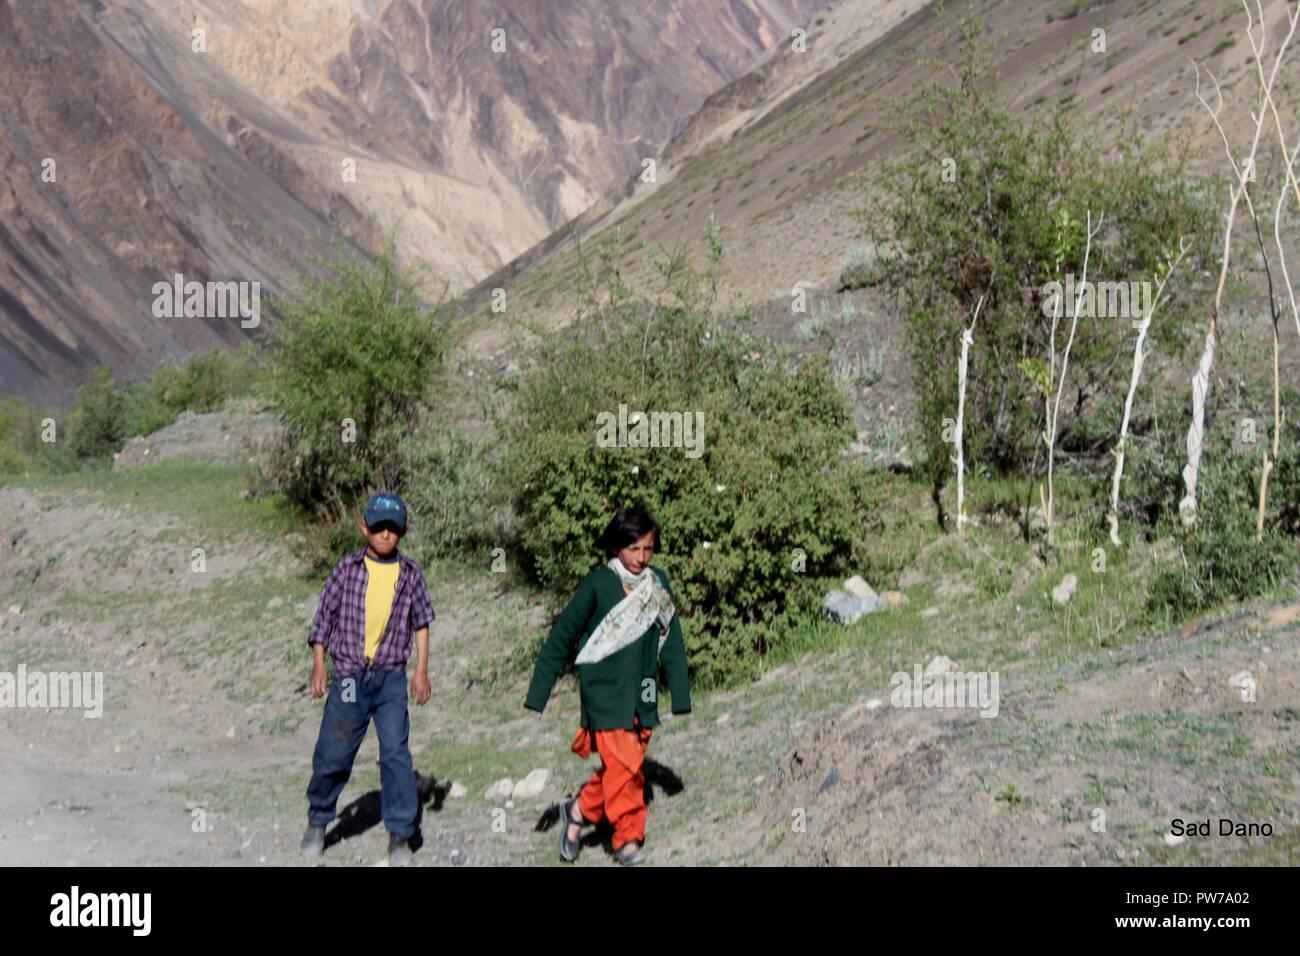 chapursan kids - Stock Image